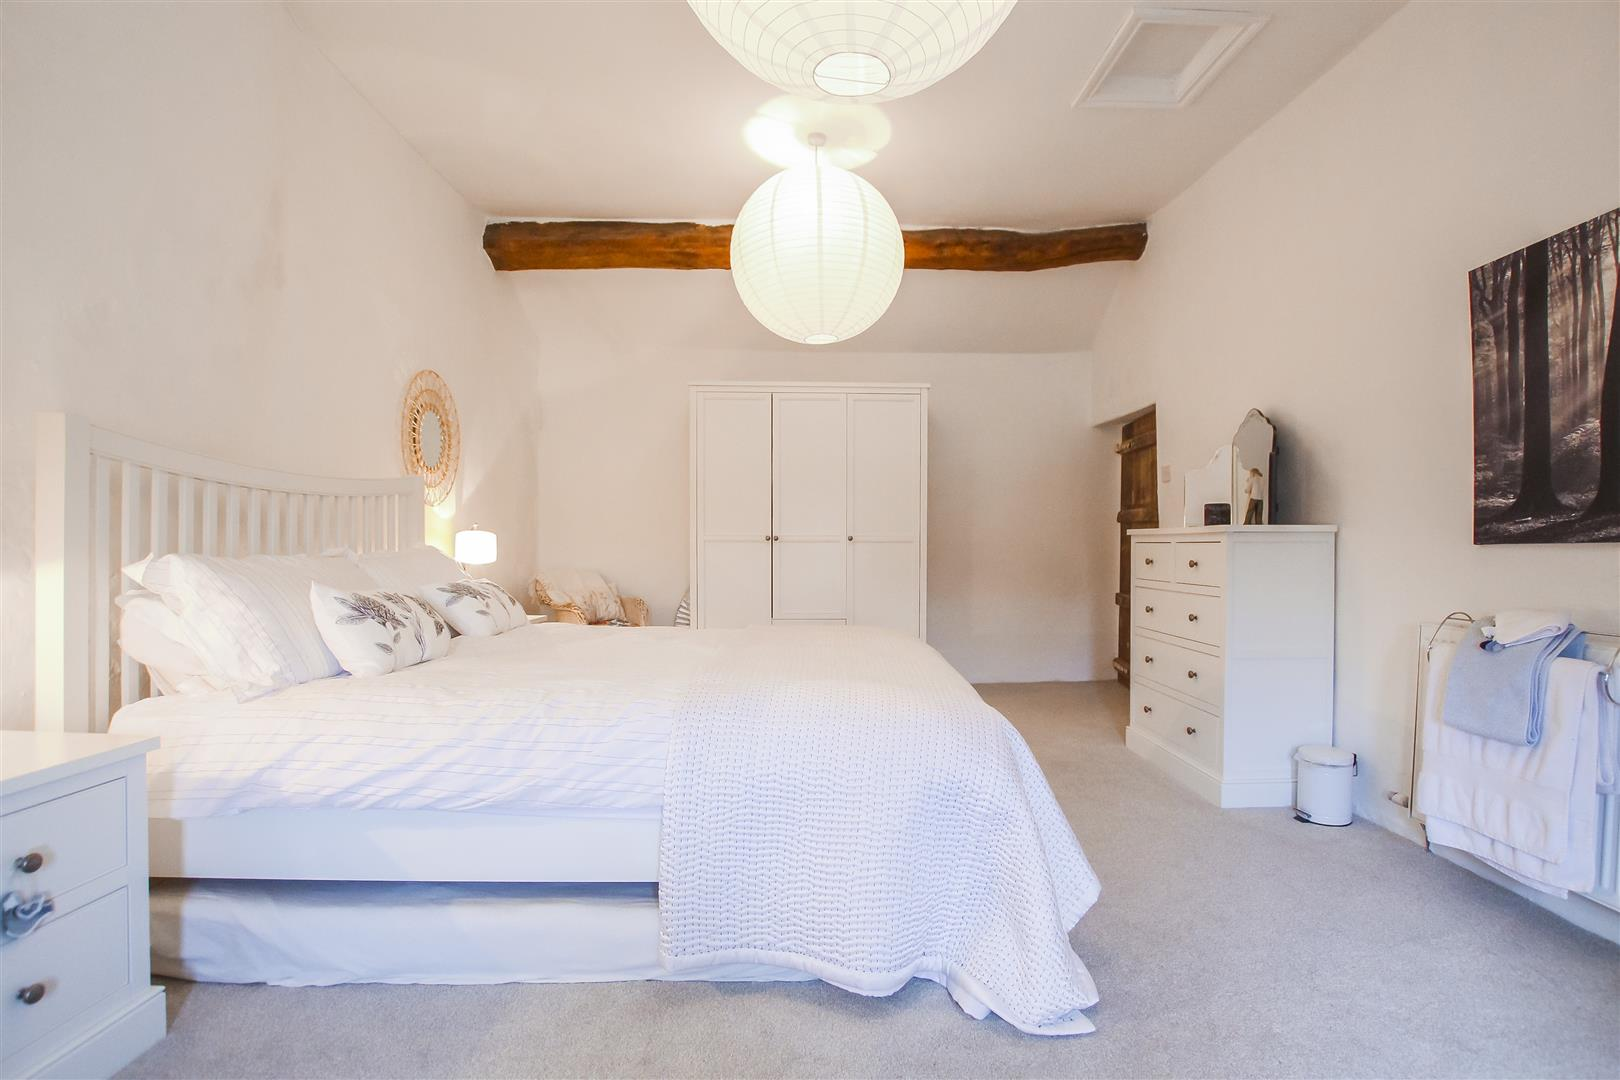 4 Bedroom House For Sale - Bedroom